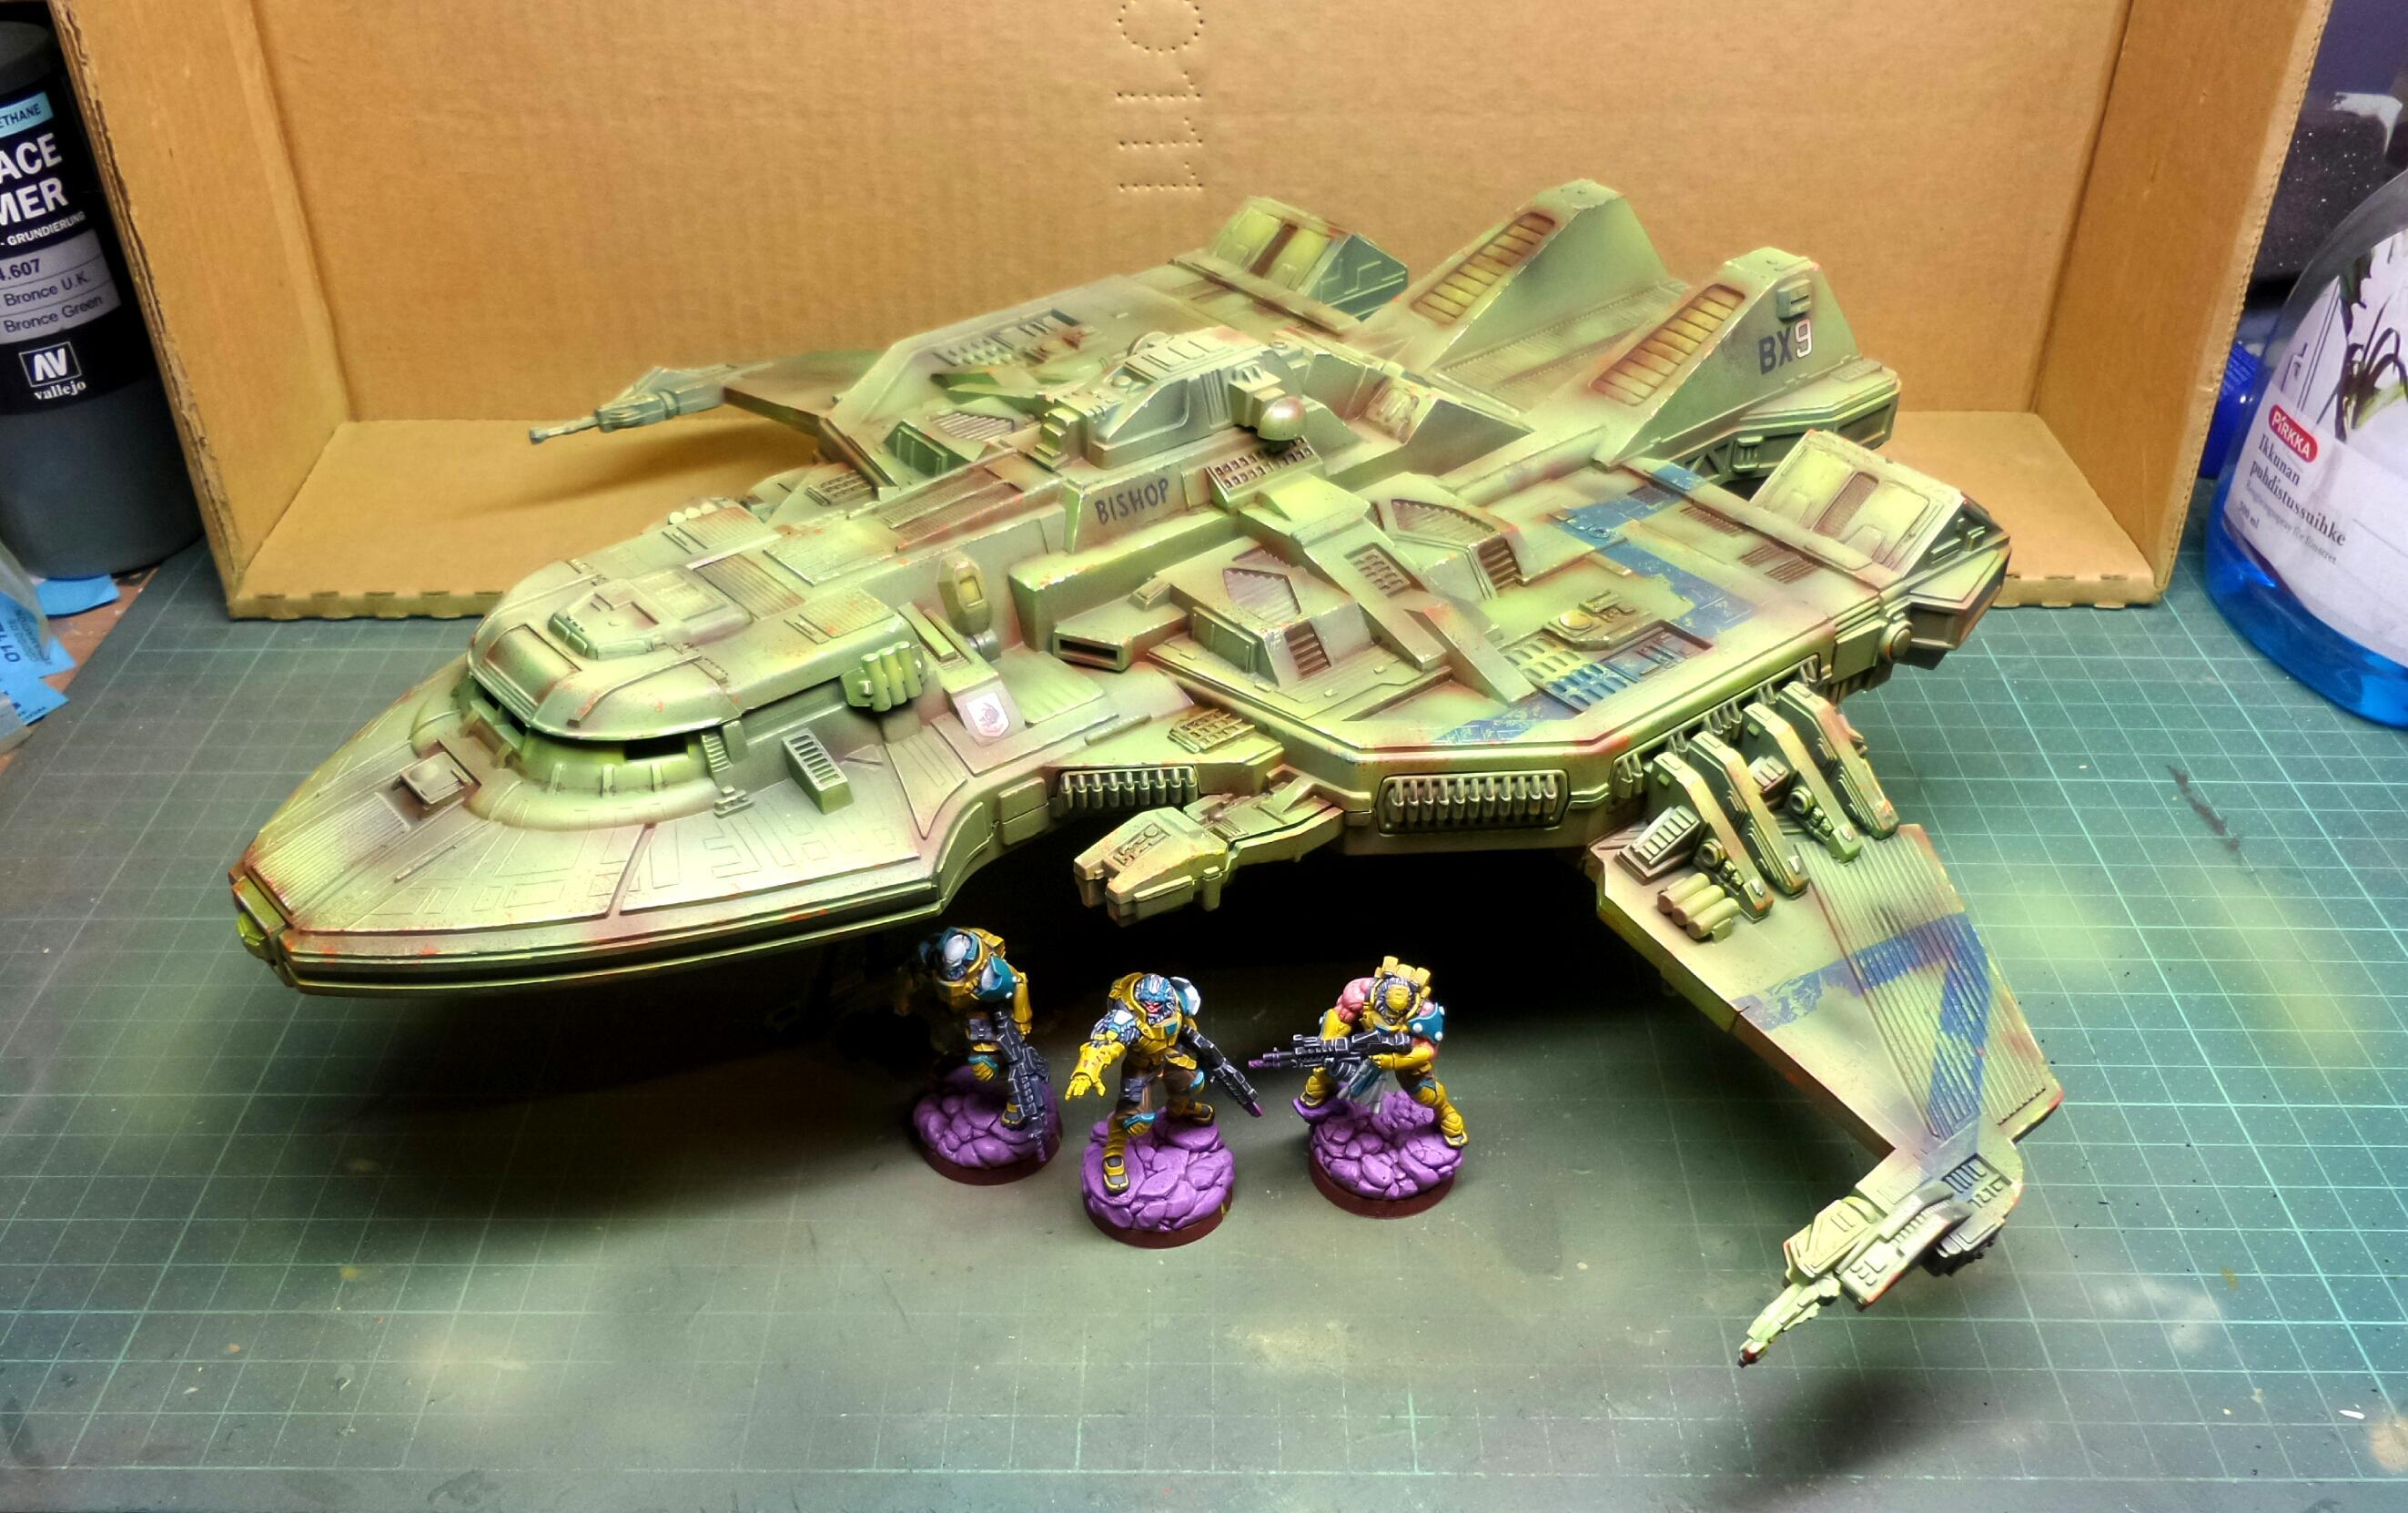 Drop Ship, Maquis, Marquis, Shuttle, Star Trek